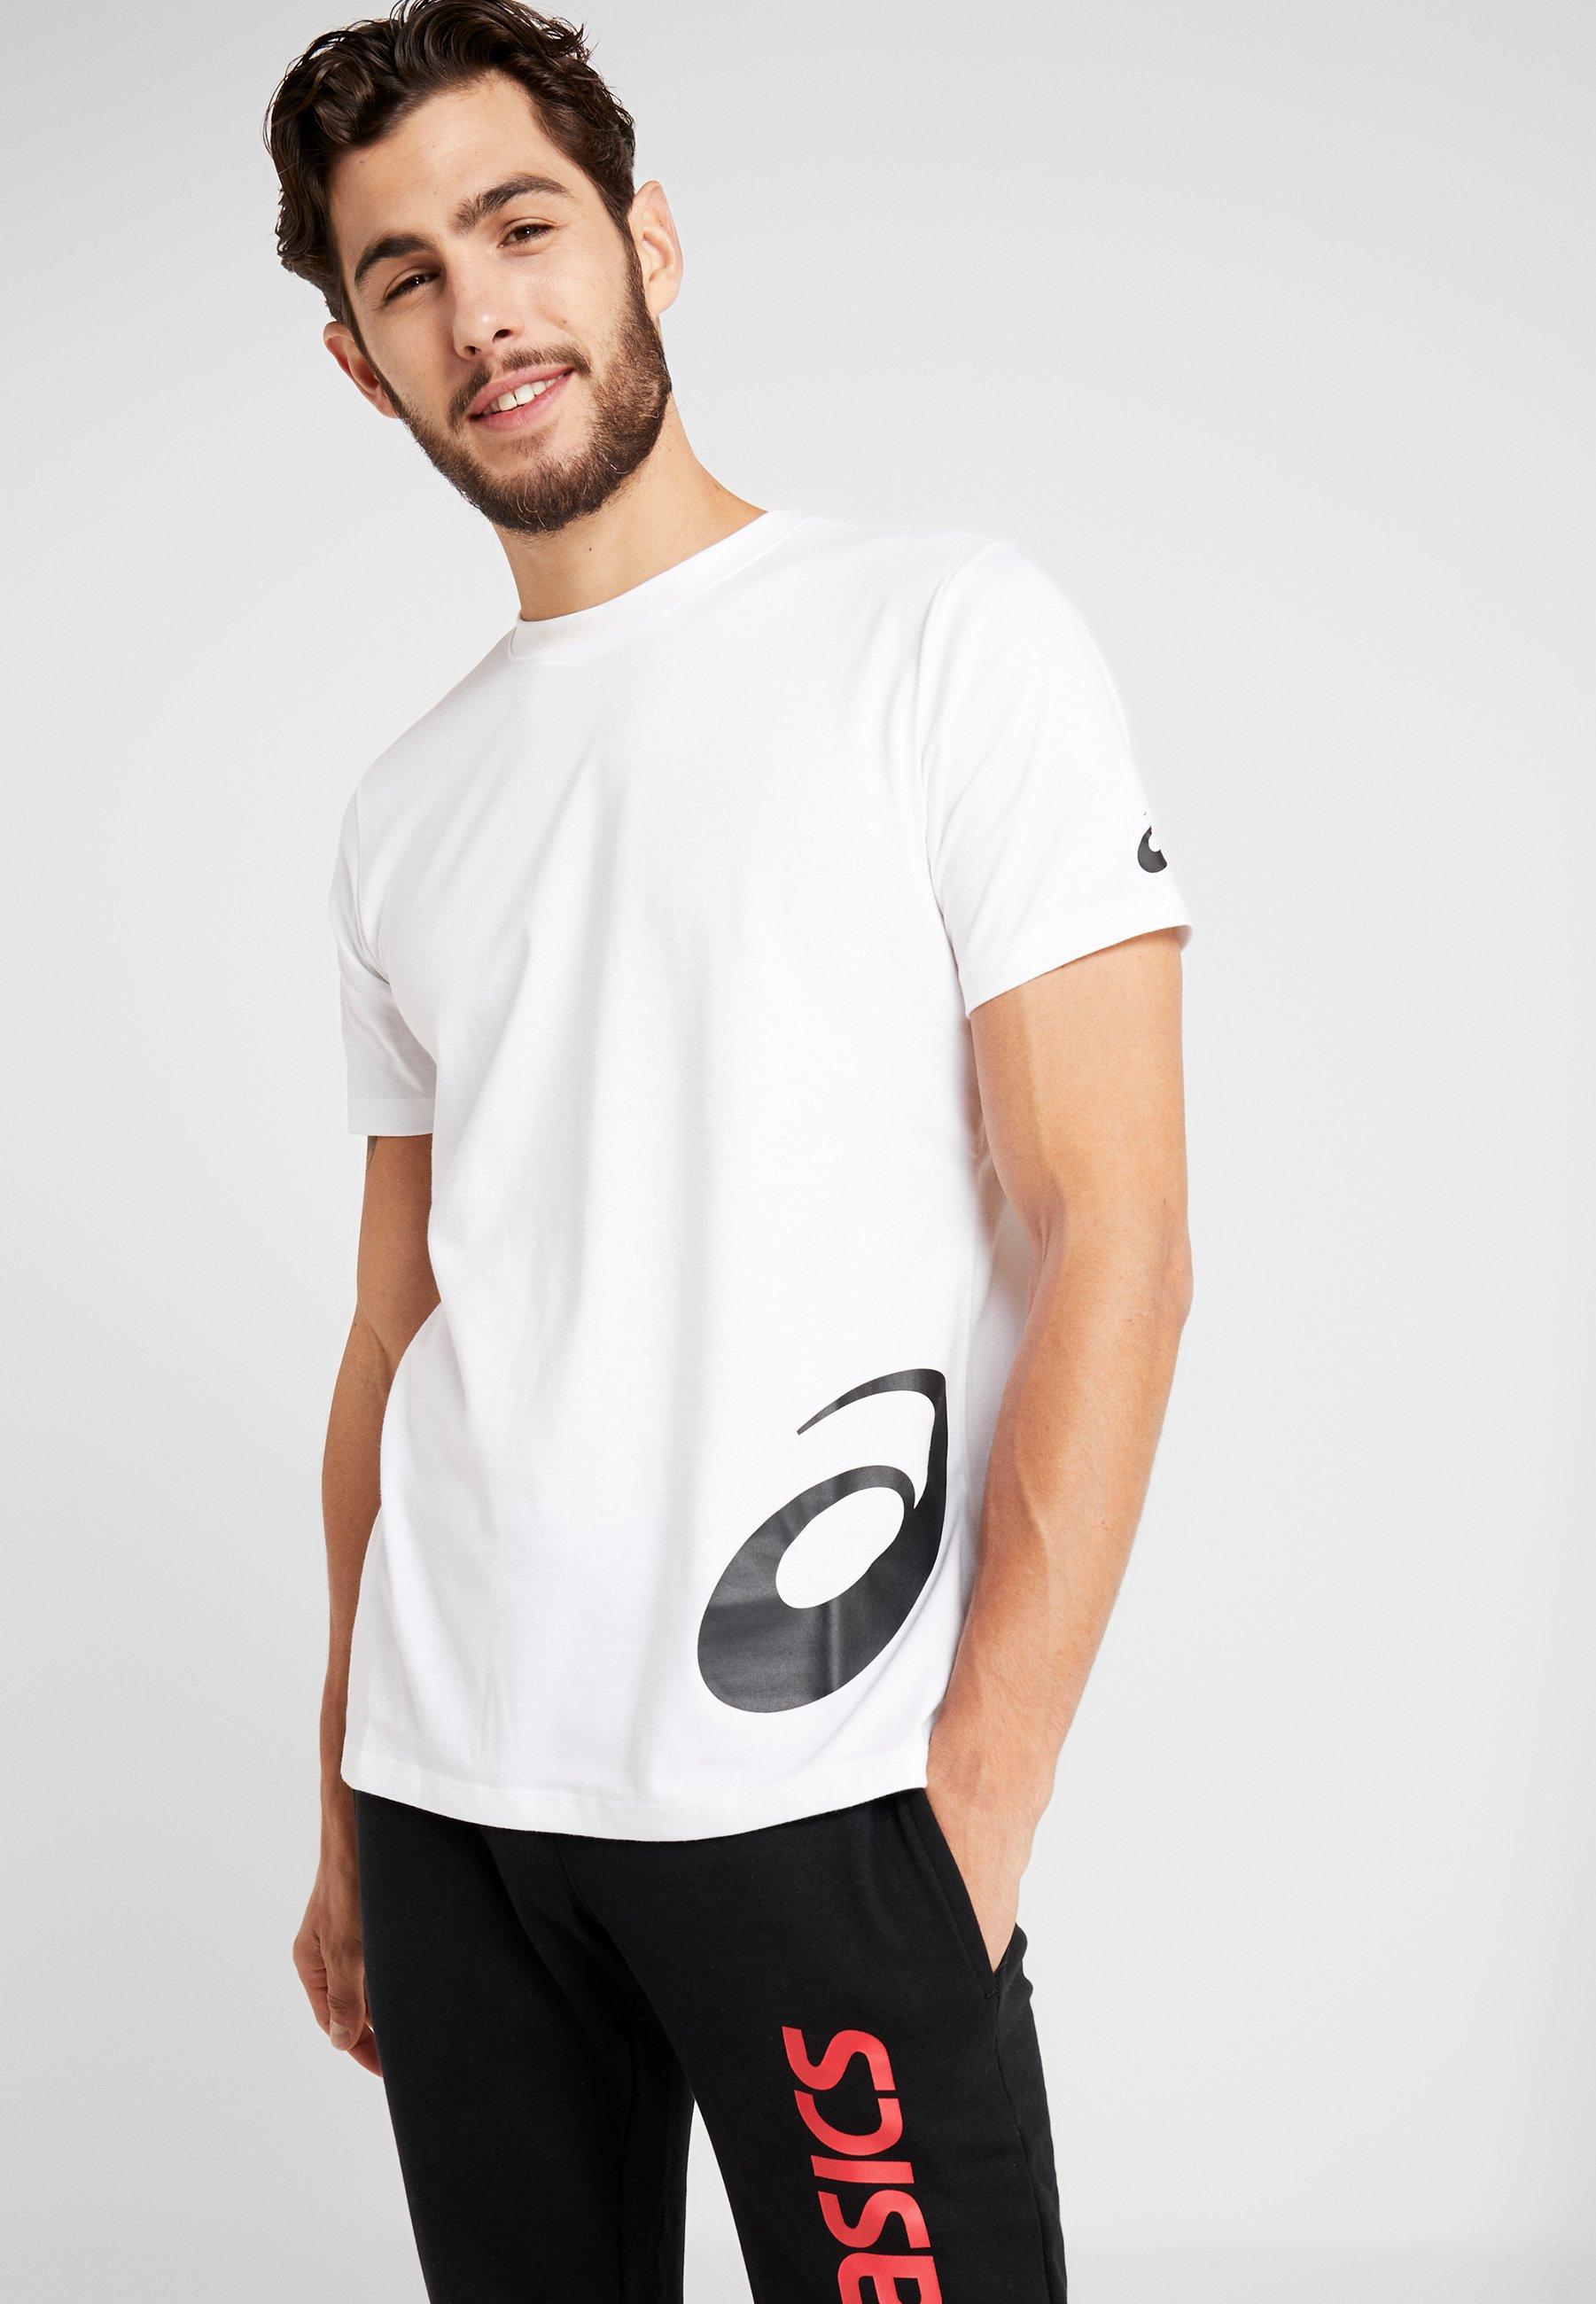 shirt performance Asics Black Logo Low Brilliant TeeT Imprimé White Big b7yvYfg6